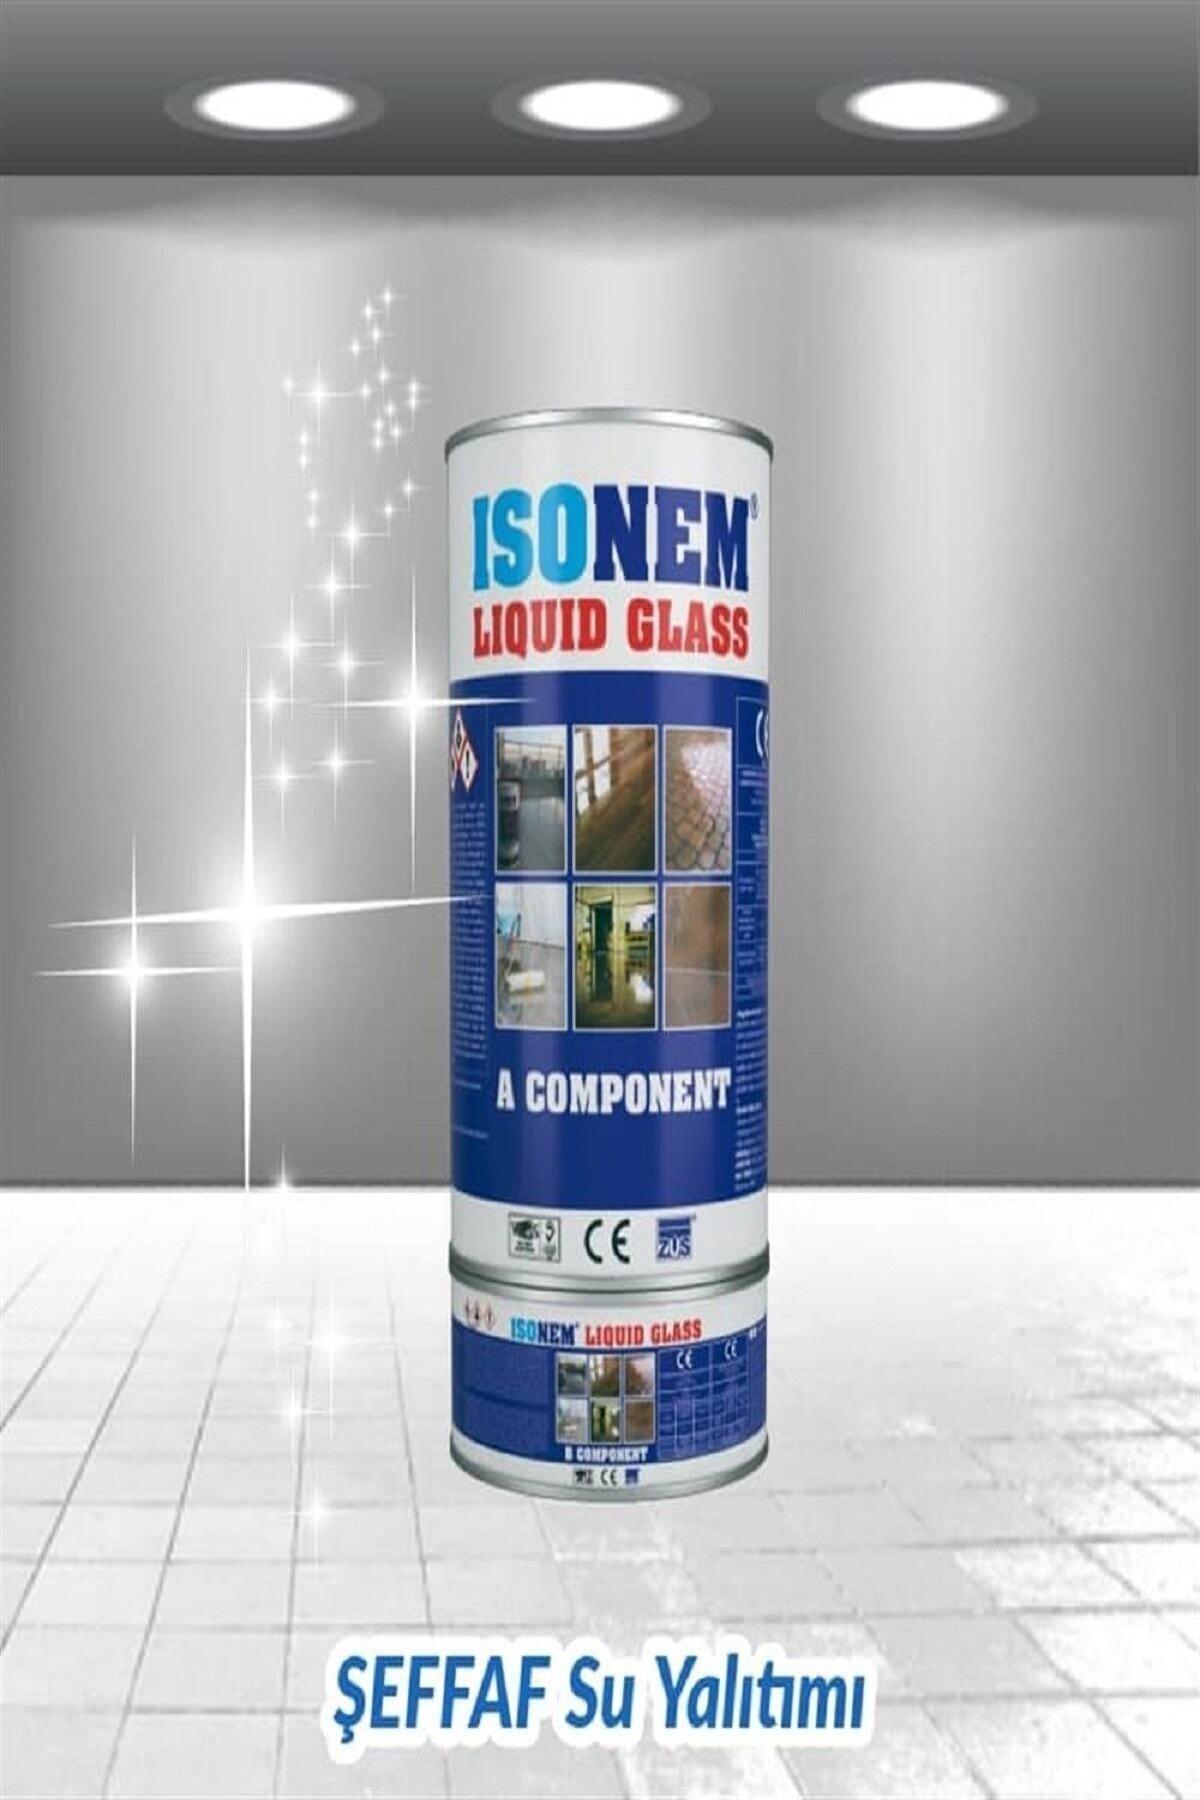 Isonem Liquid Glass (Sıvı Cam) 2 Kg Şeffaf Zemin Su Yalıtımı 1